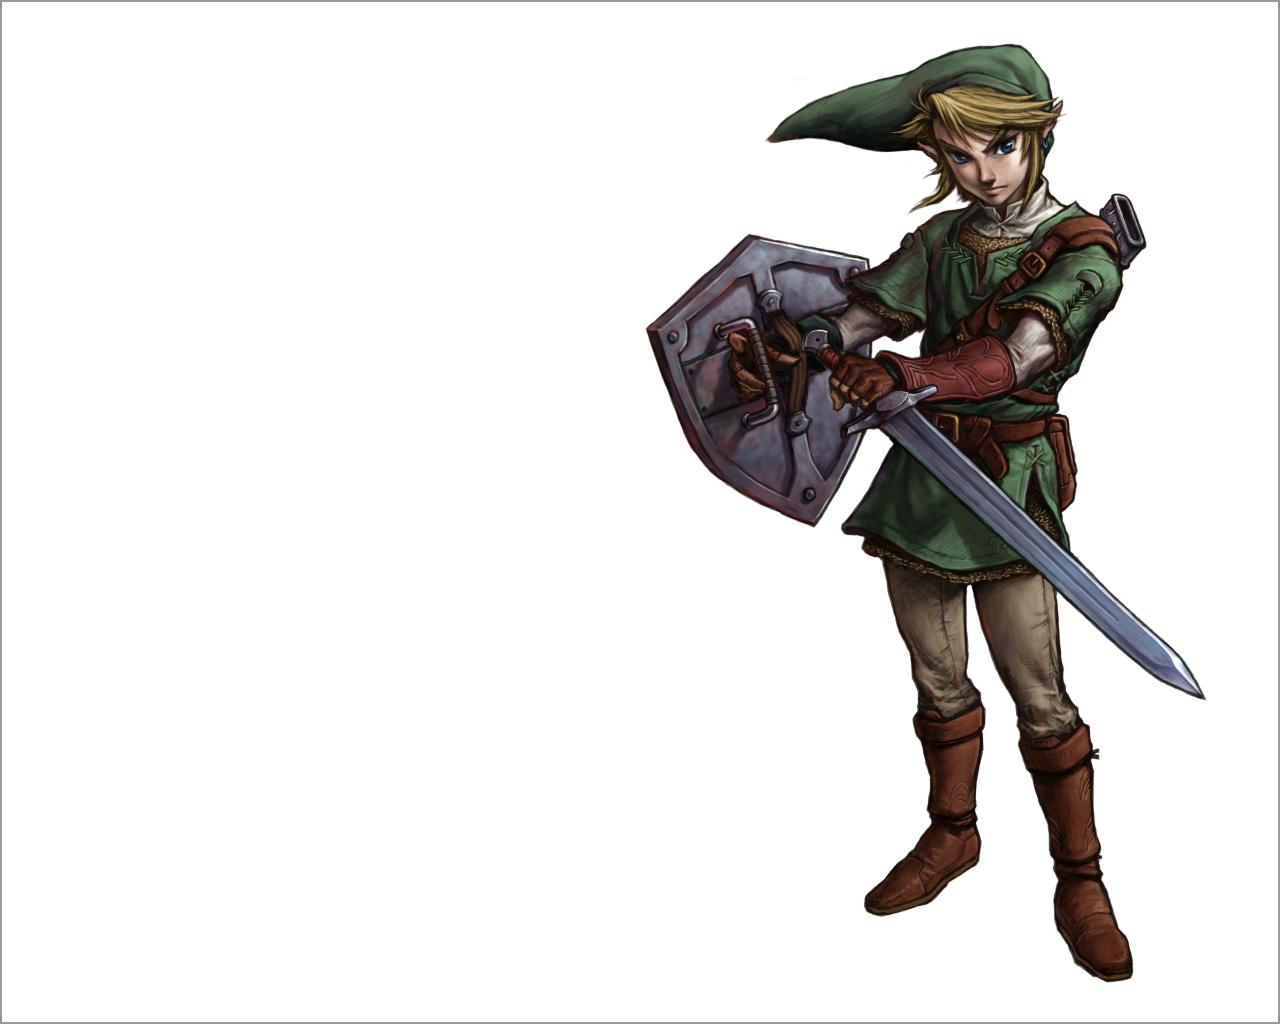 Link Twilight Princess   The Legend of Zelda Wallpaper 317906 1280x1024